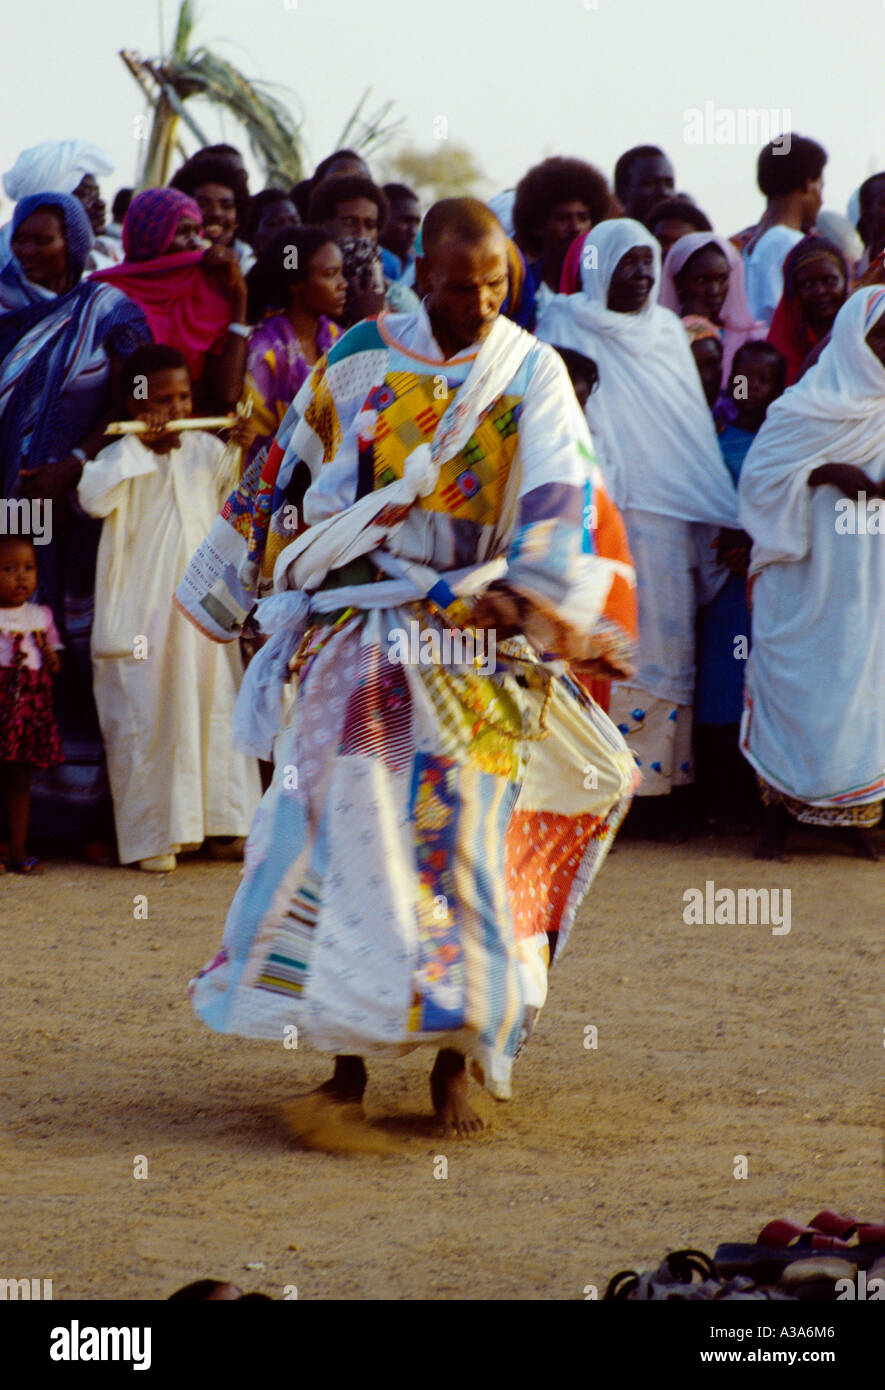 Omdurman Sudan Dervish Dancers (answar) Friday After Sunset (sufi) Call To Prayer & Dance Reciting Quran - Stock Image